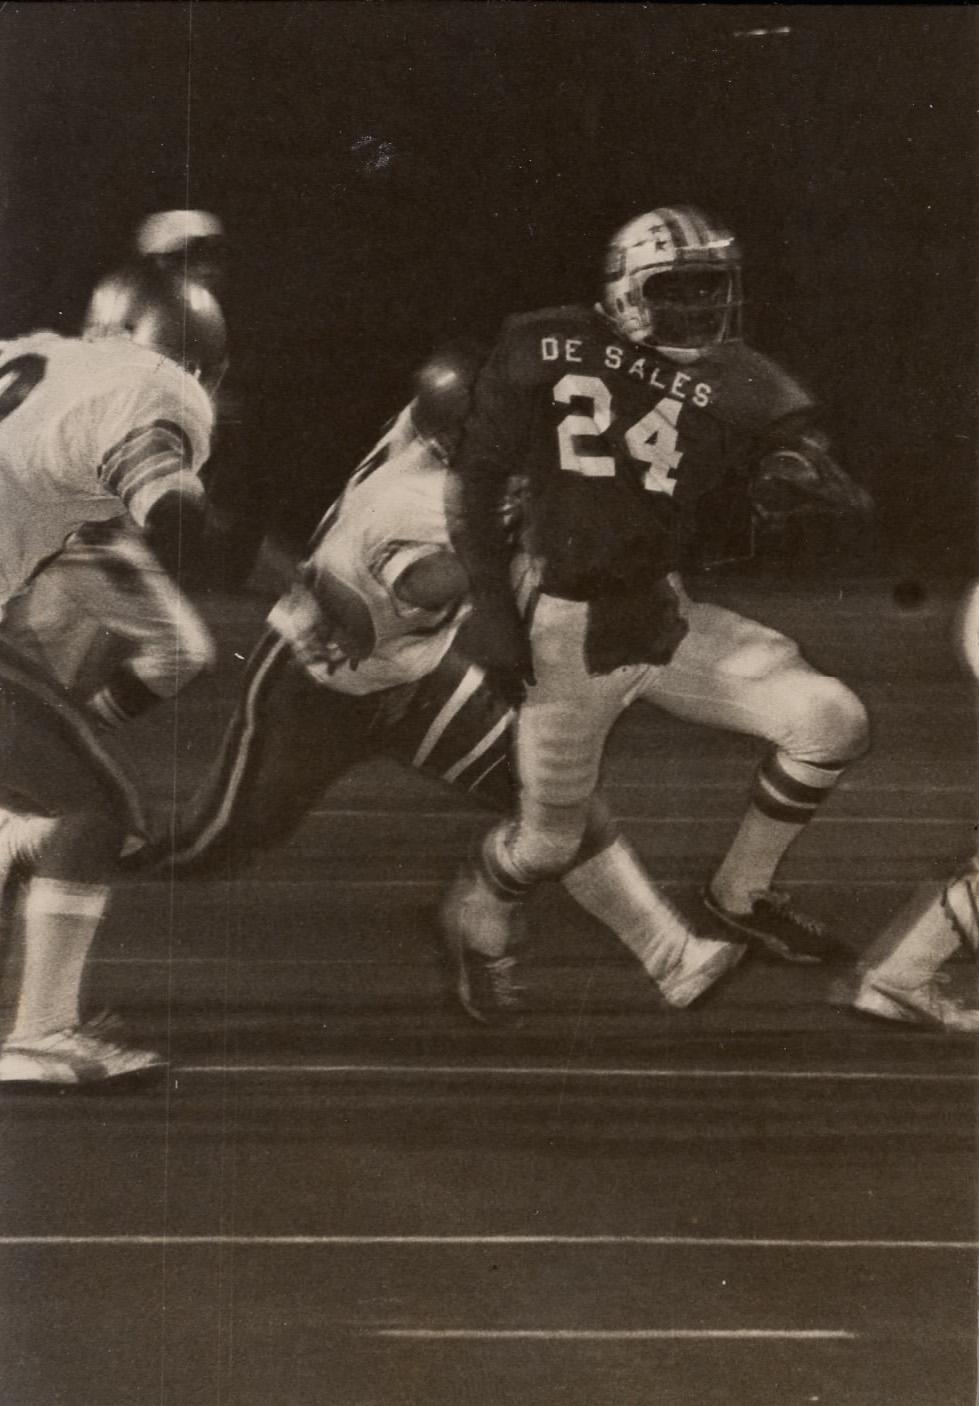 Eric Holleman '80, quarterback